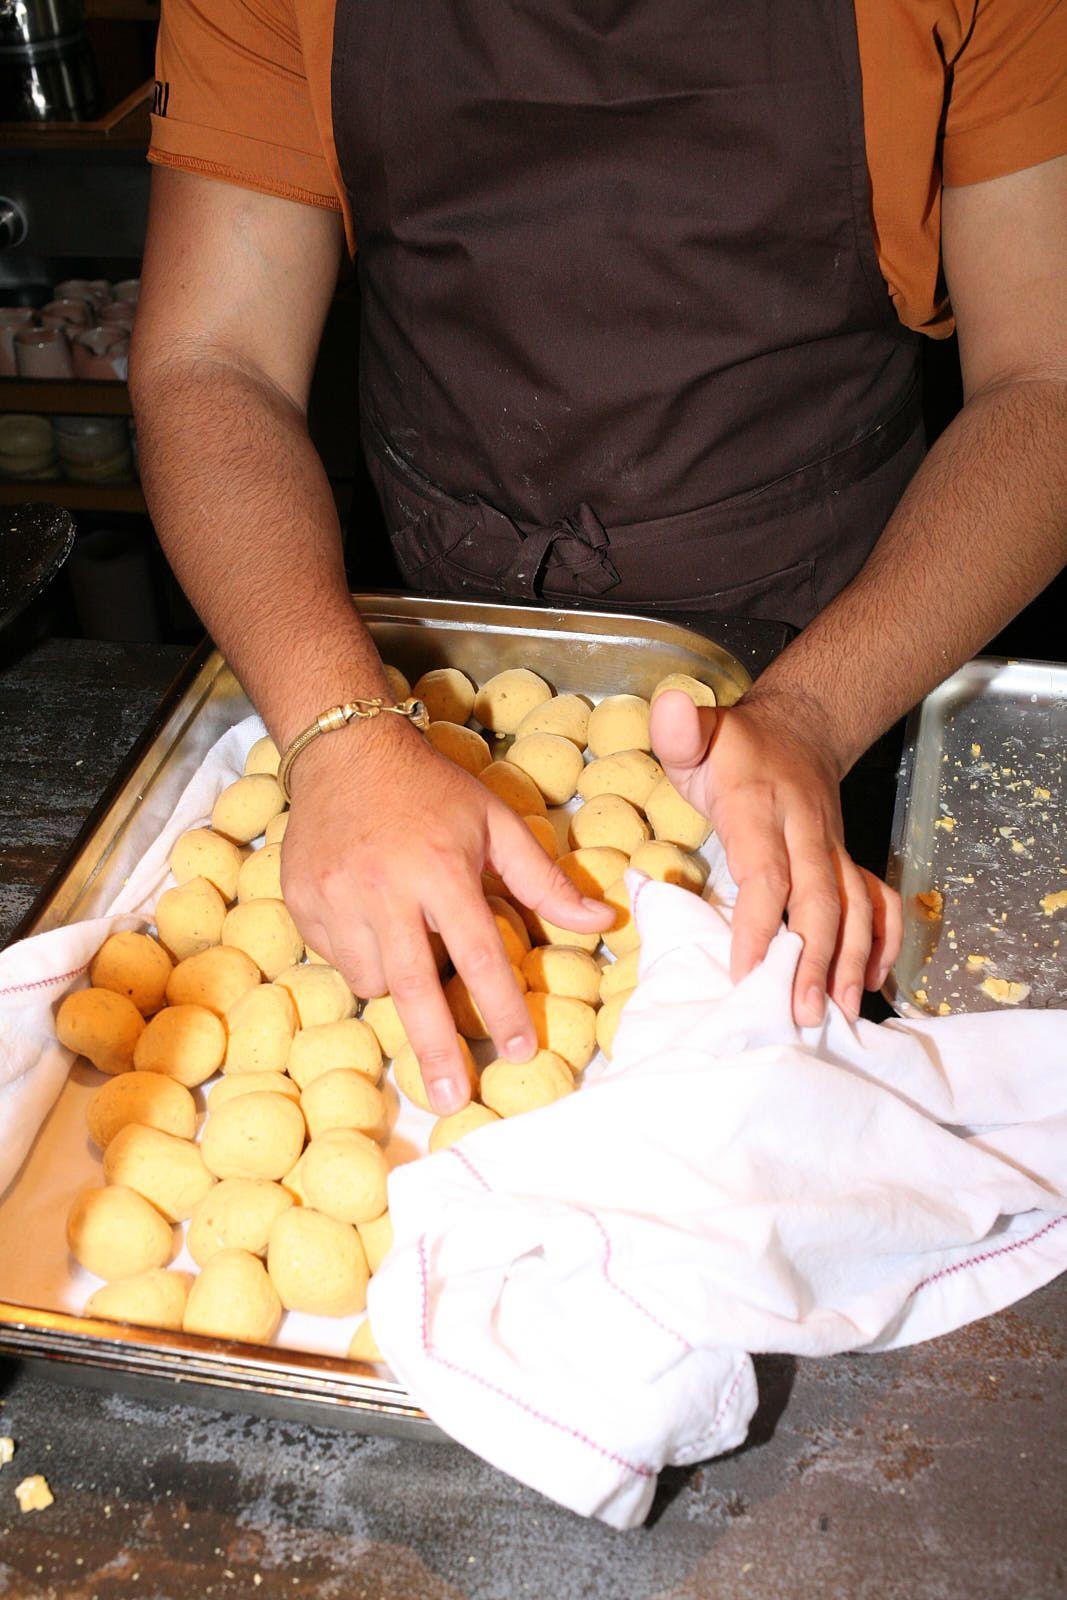 Balls of masa pre-pressing into tortillas at Santiago Lastra's Kol in Marylebone, central London